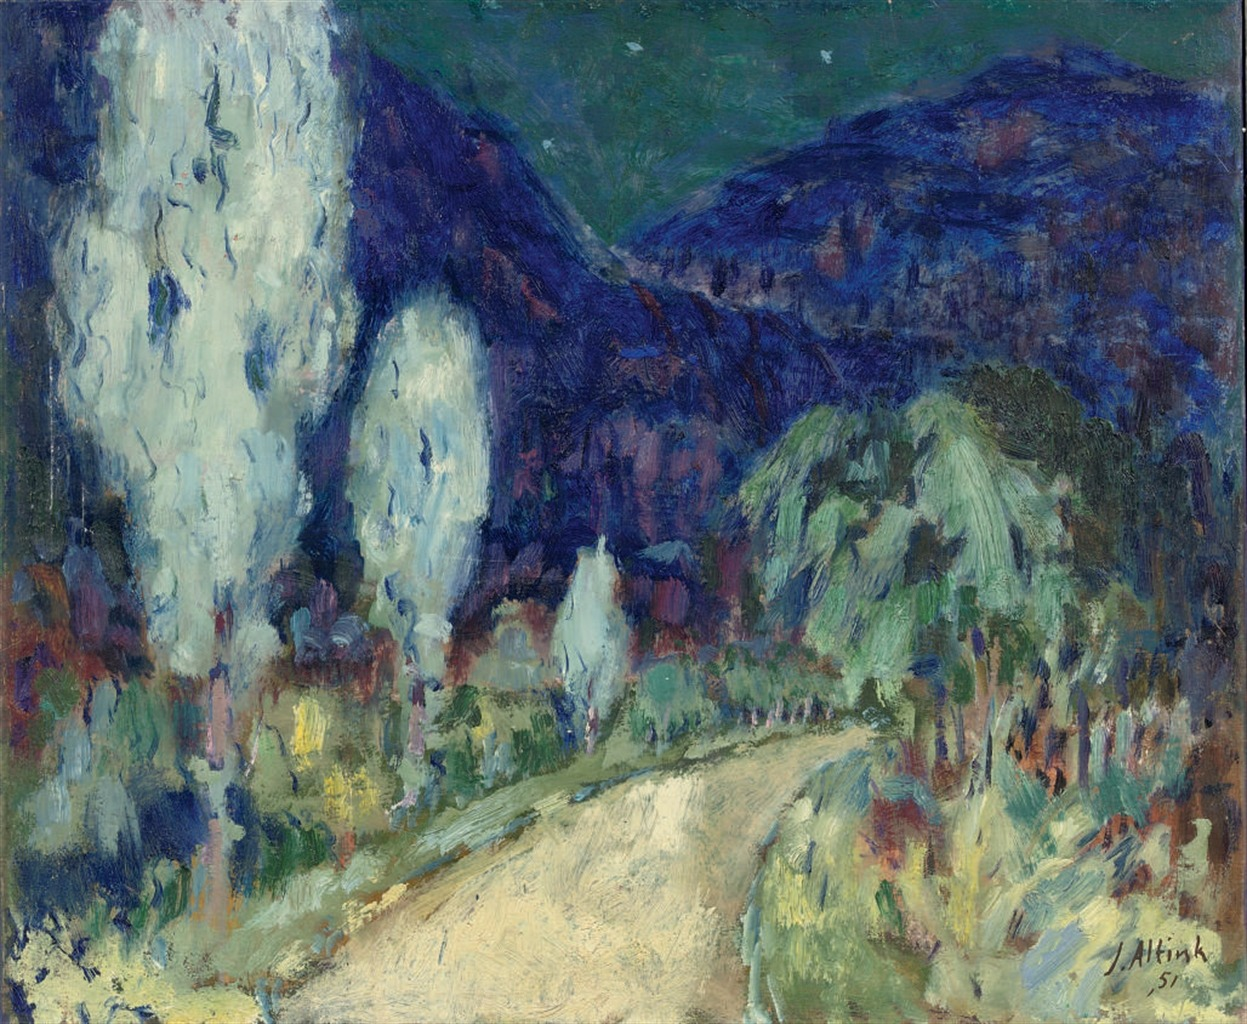 thunderstruck9:  Jan Altink (Dutch, 1885–1971), A hilly landscape by night, 1951. Oil on canvas, 50 x 60 cm.